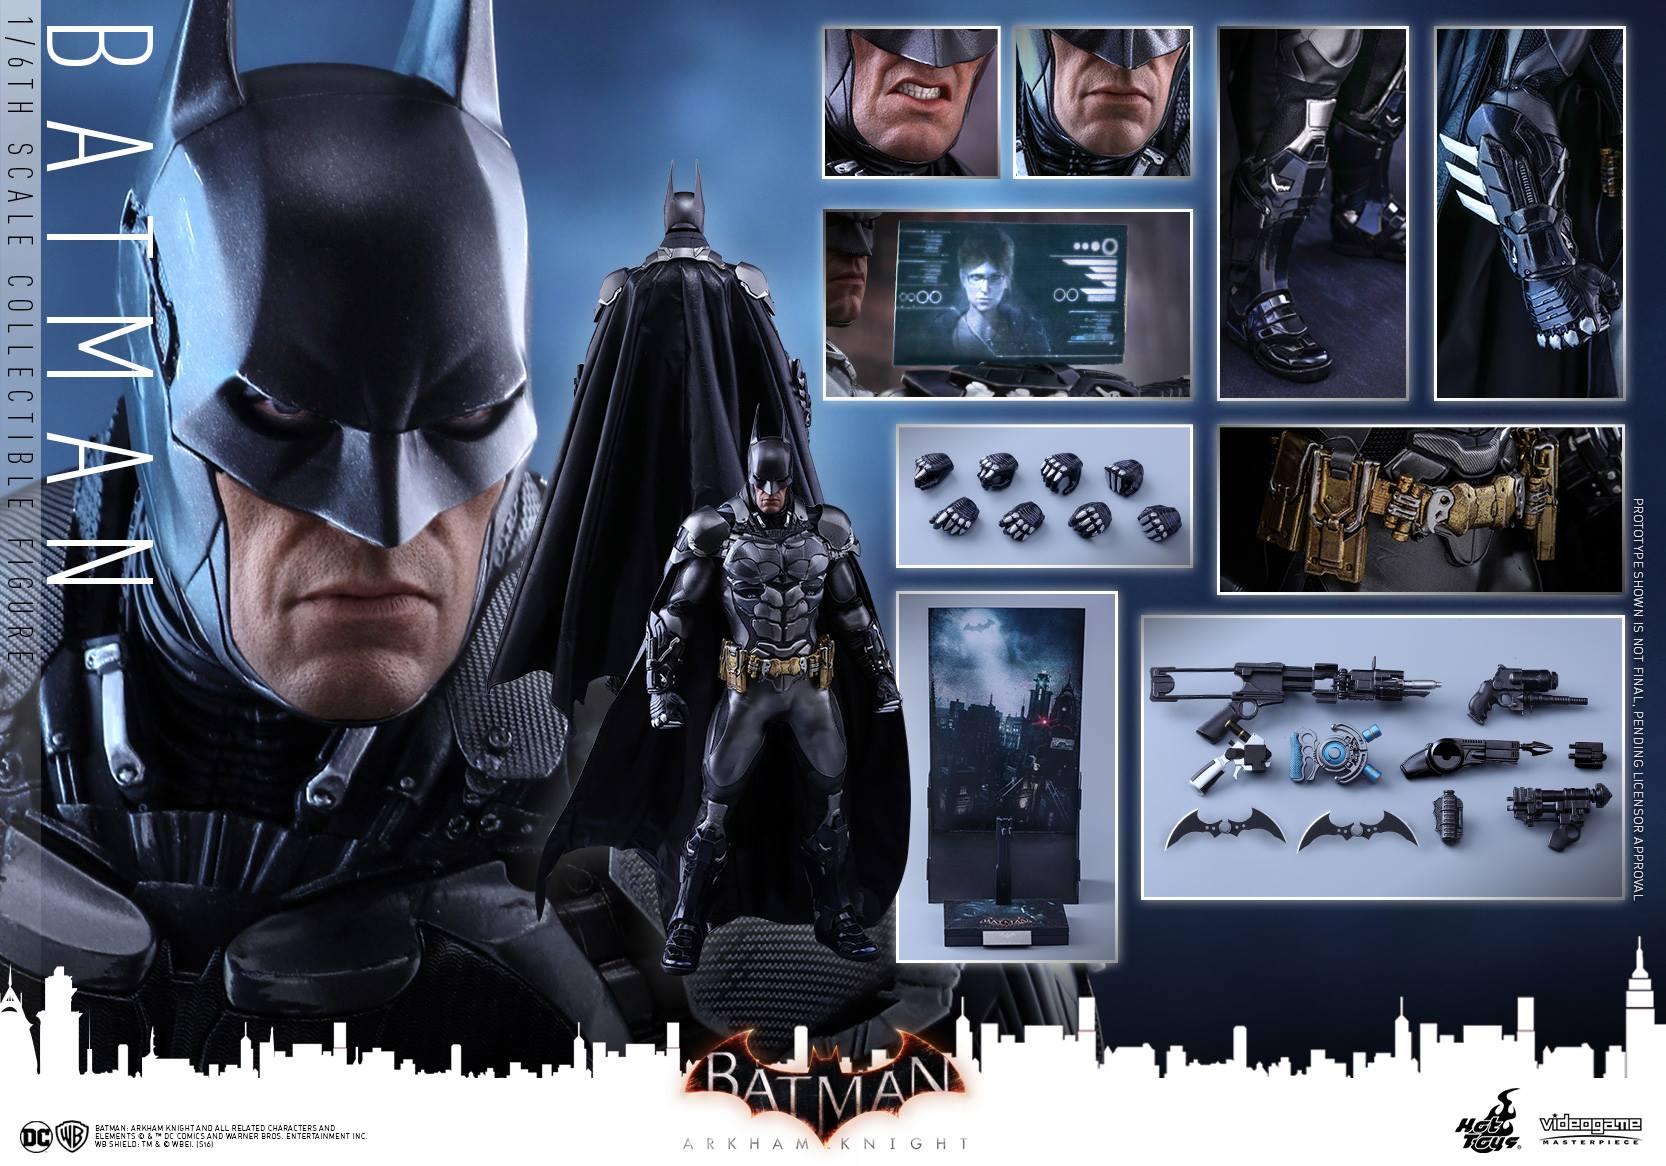 Hot Toys Batman: Arkham Knight Sixth Scale Figure Pre-Order